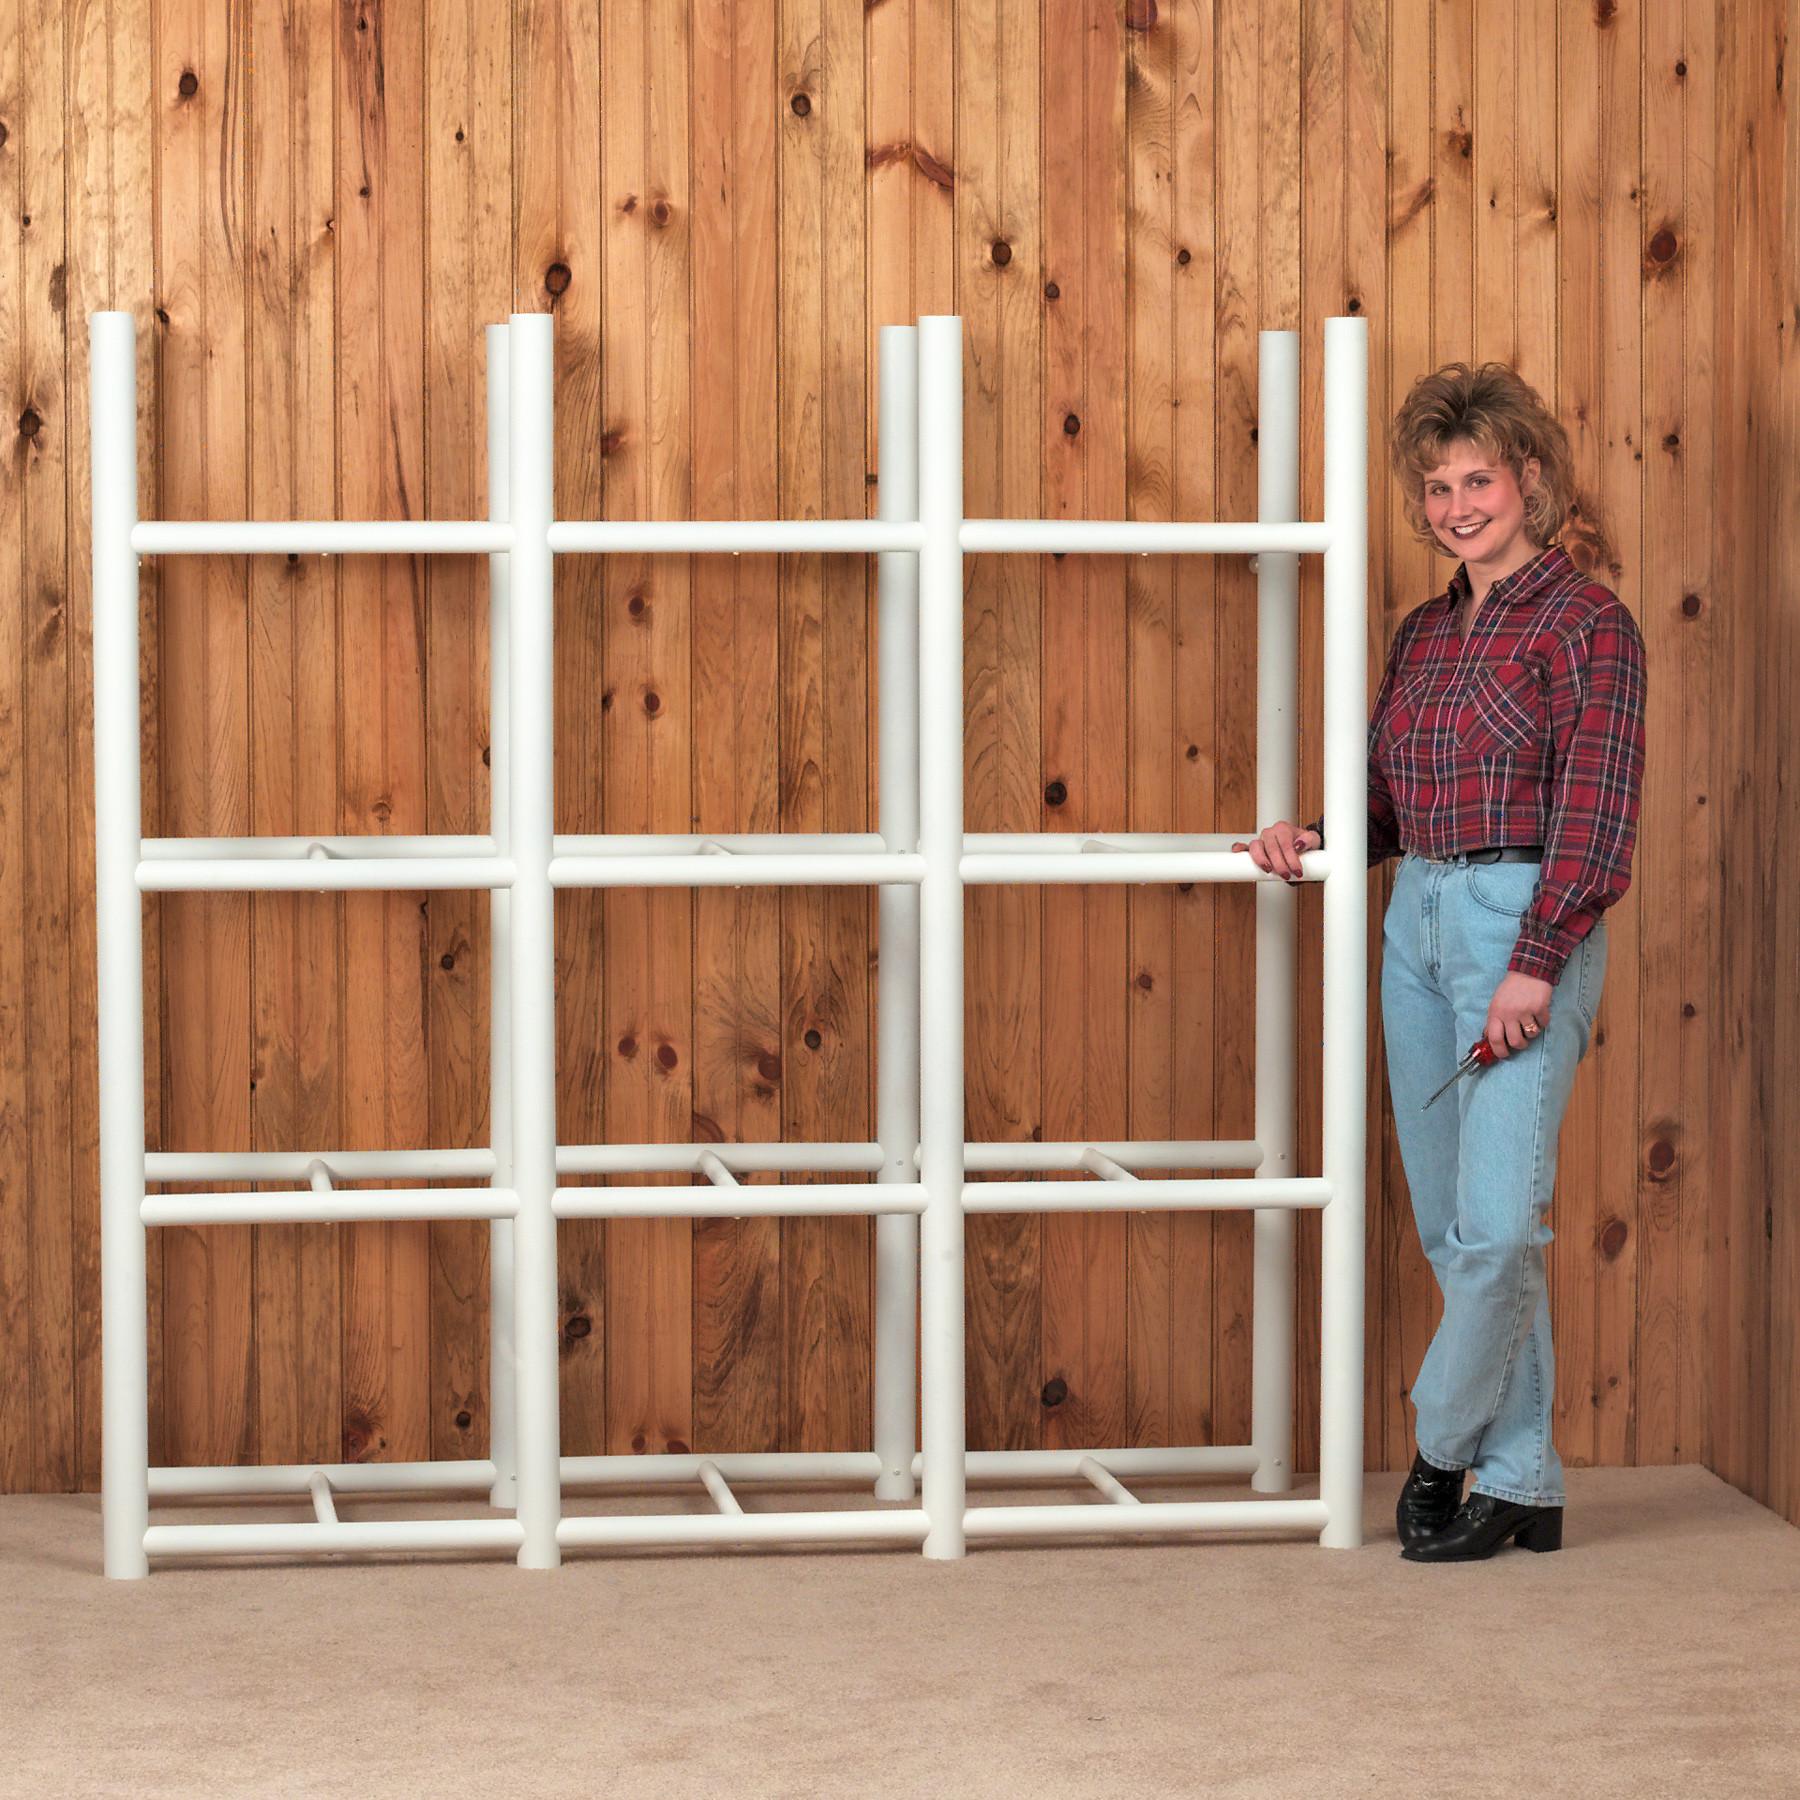 bin warehouse 12 tote storage system h 4 shelf shelving unit walmartcom